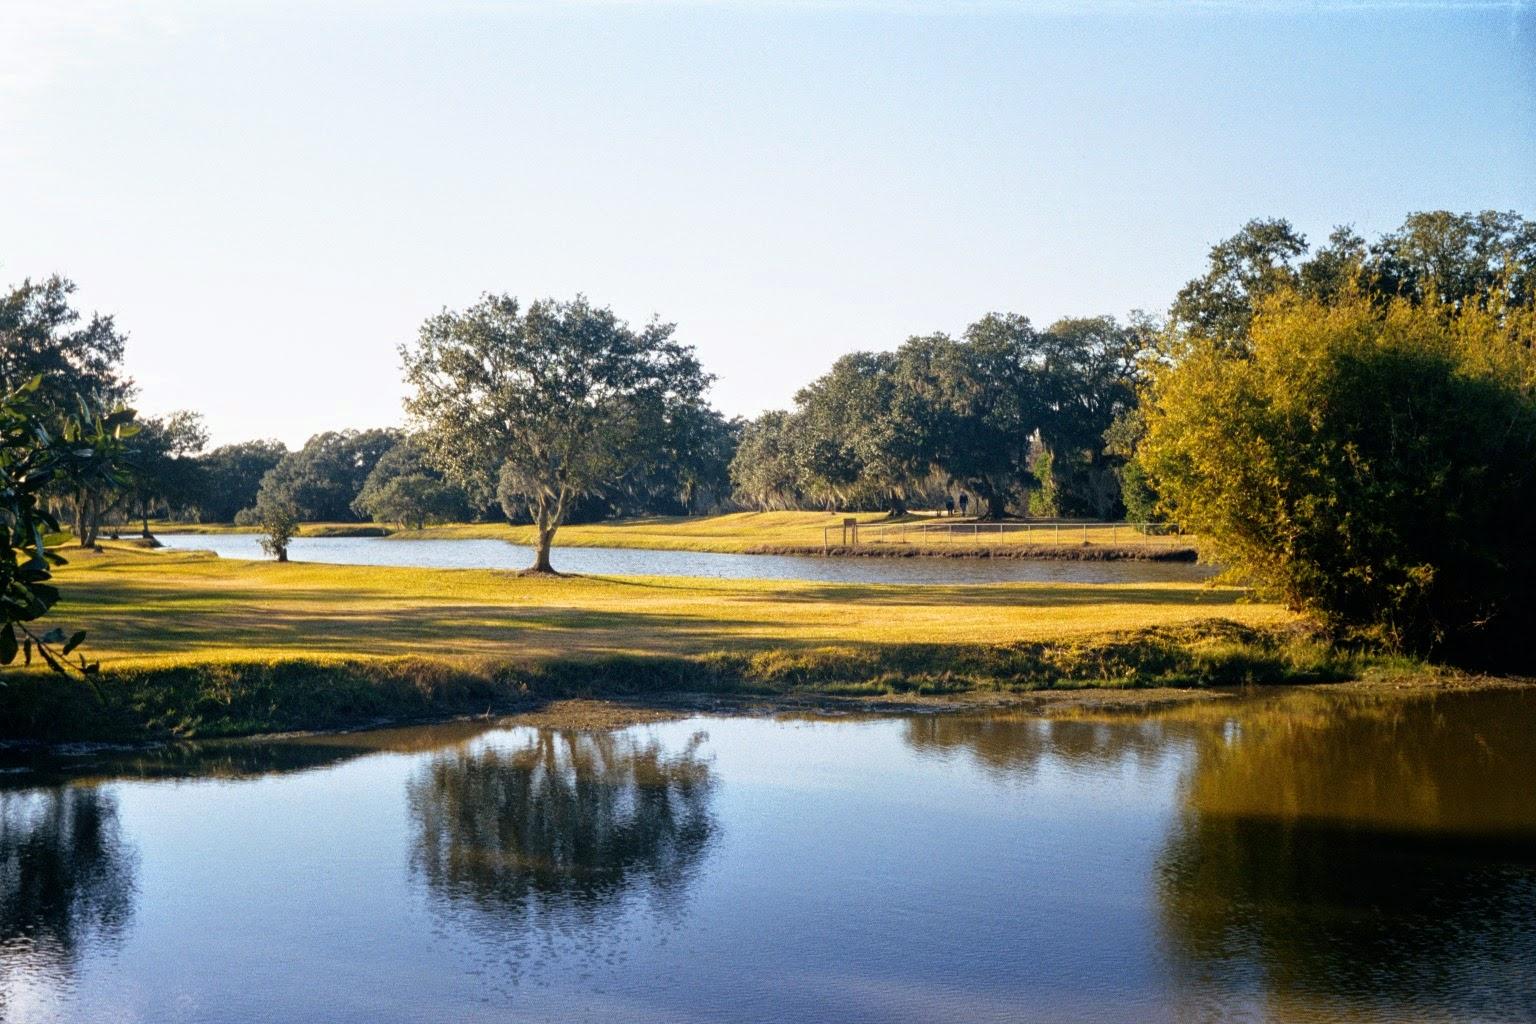 Que ver en Louisiana - Que hacer en Louisiana